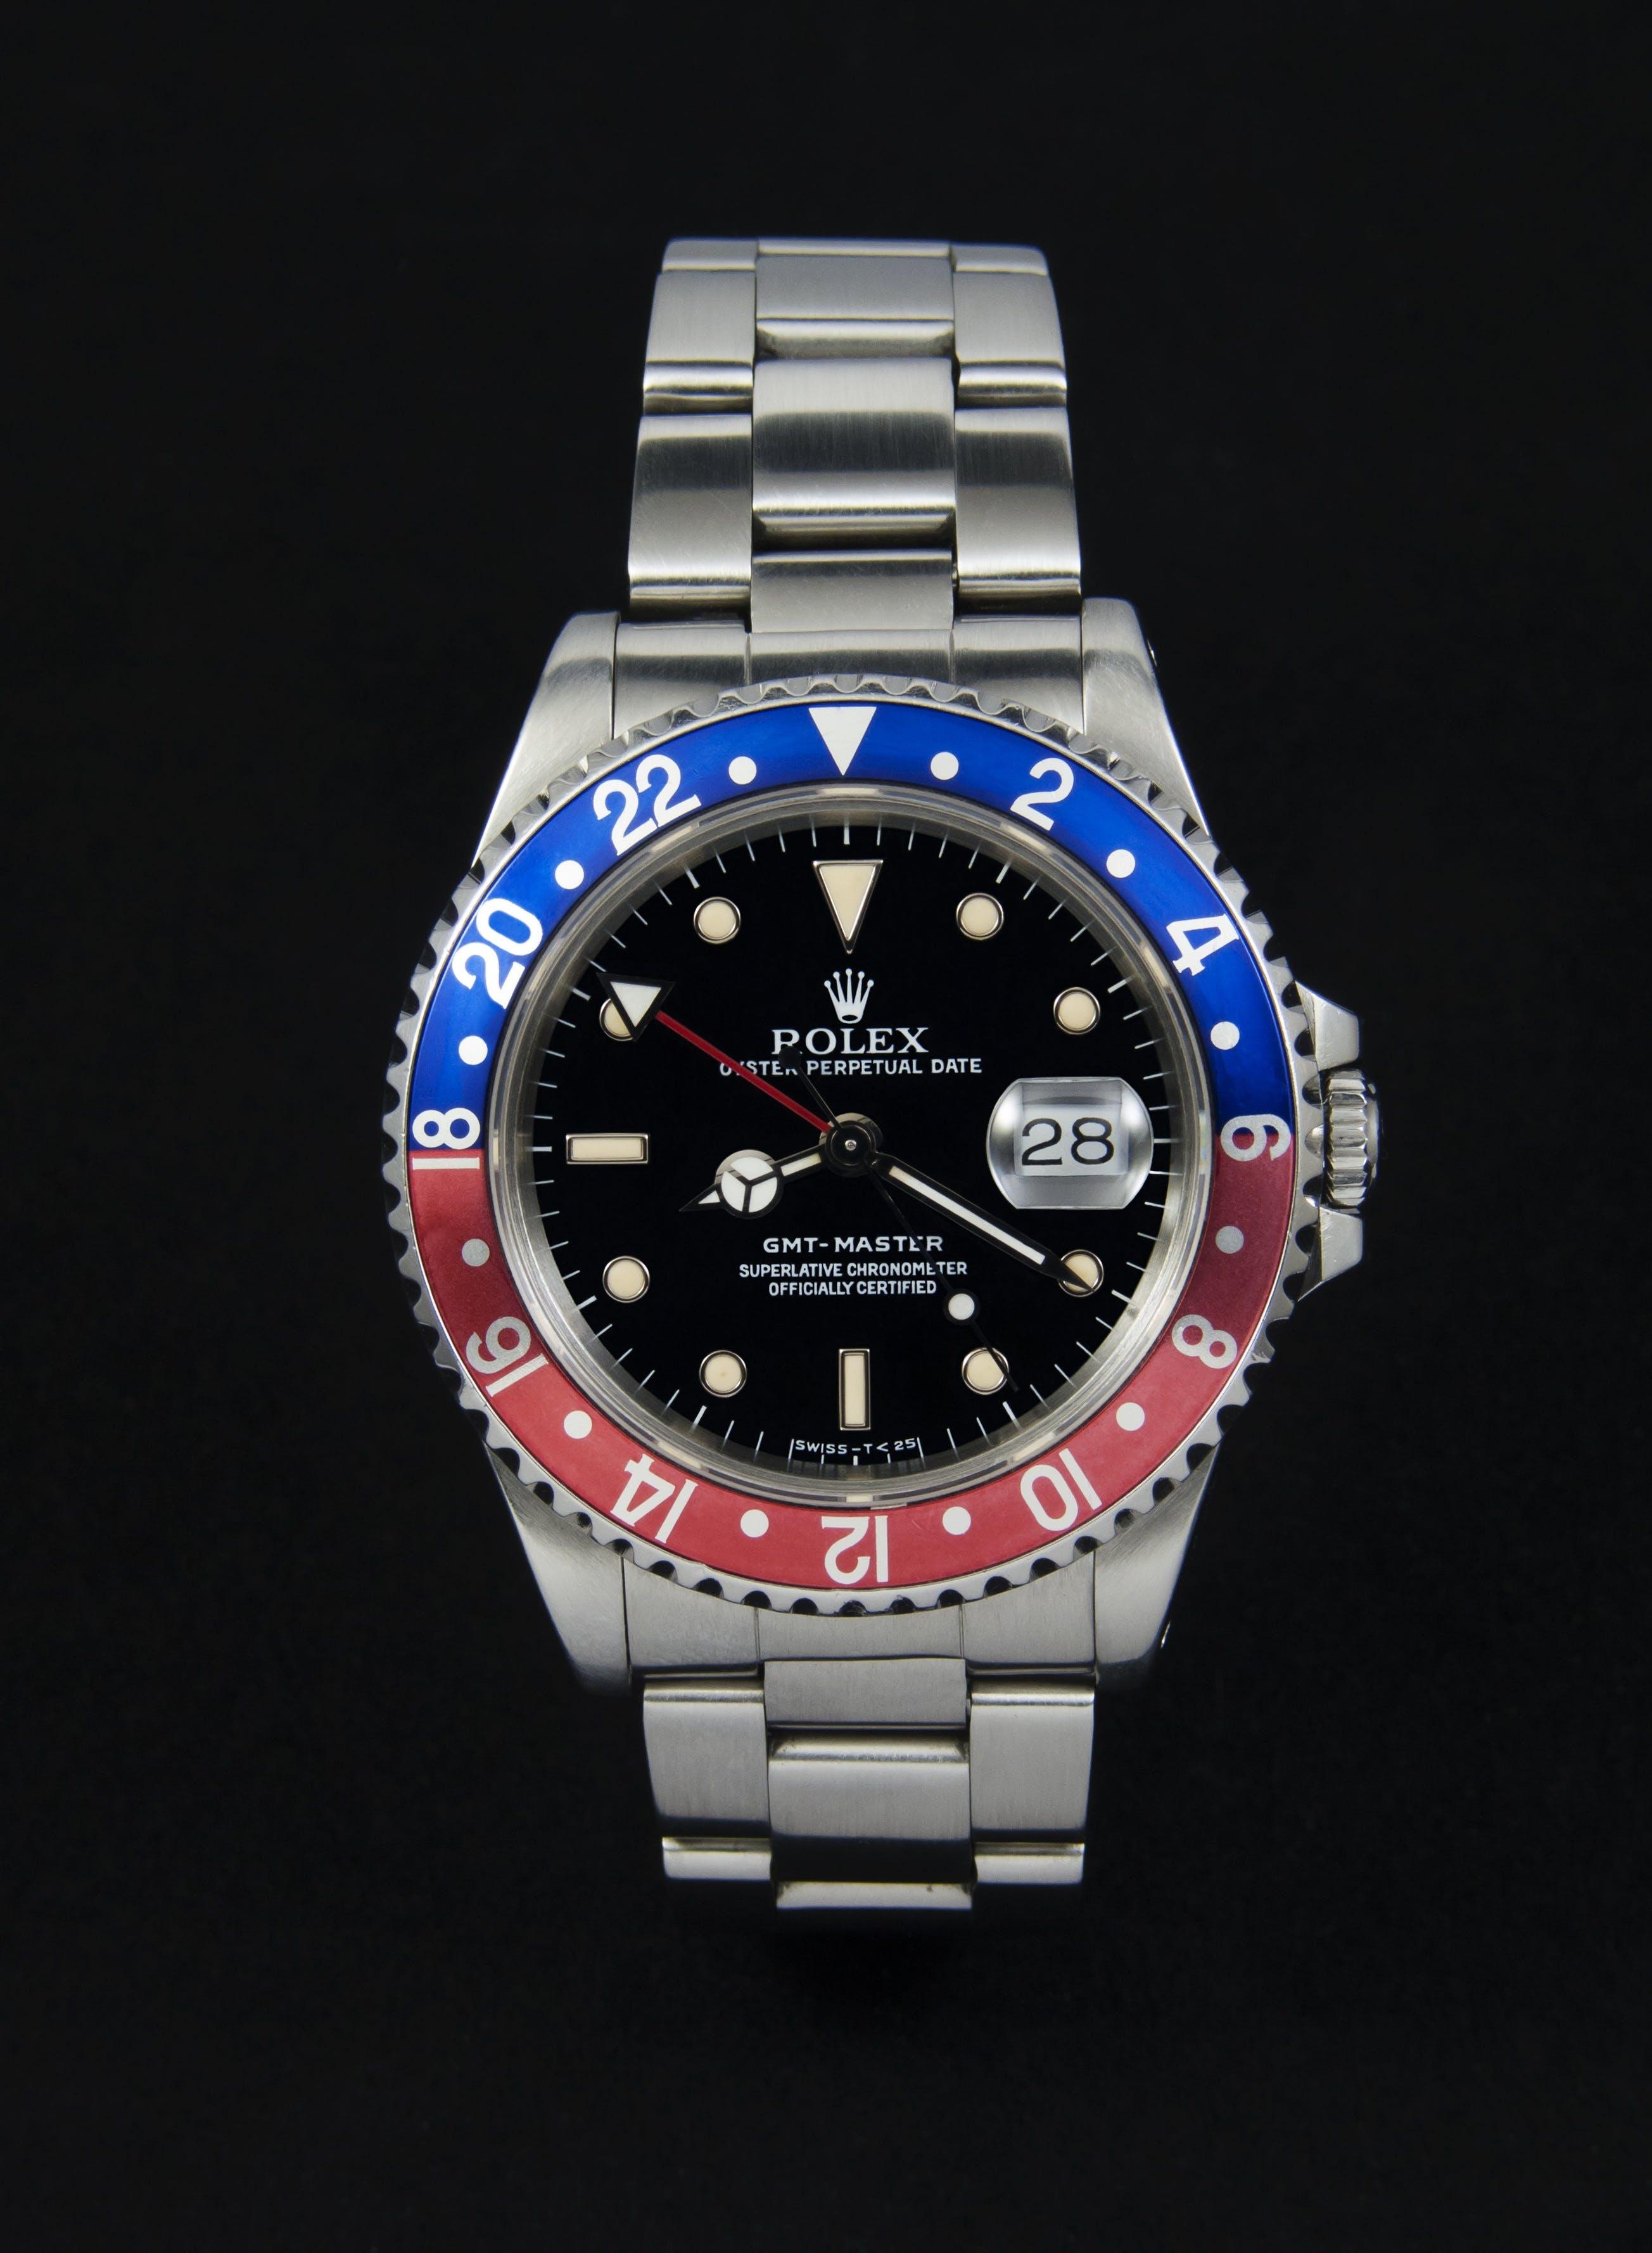 Free stock photo of luxury, watch, clock, analog